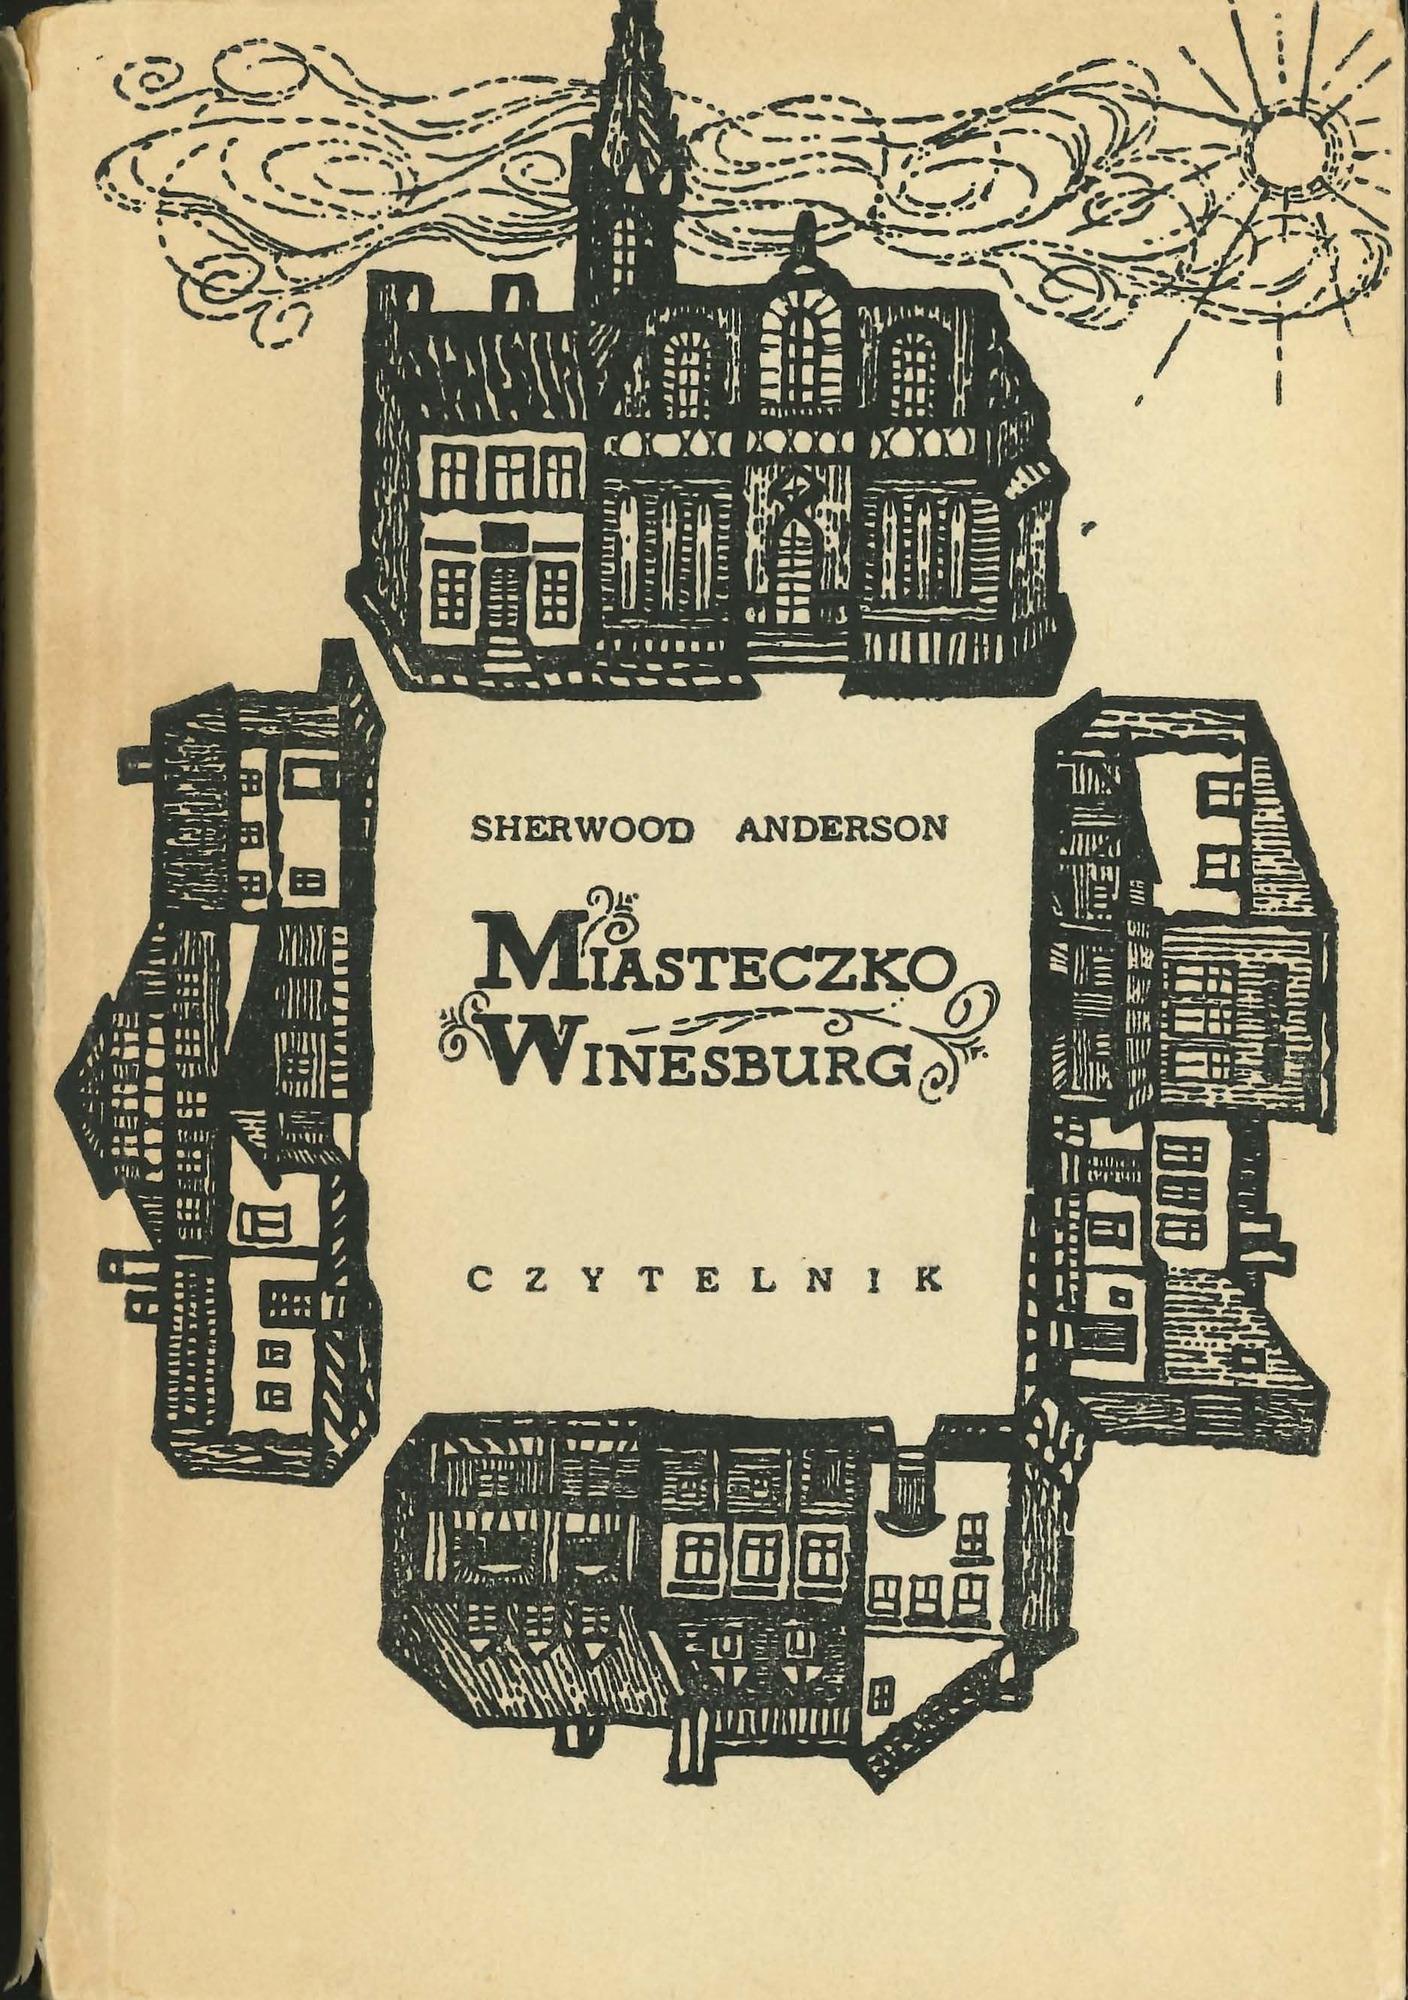 Miasteczko_Winesburg_1958.jpg